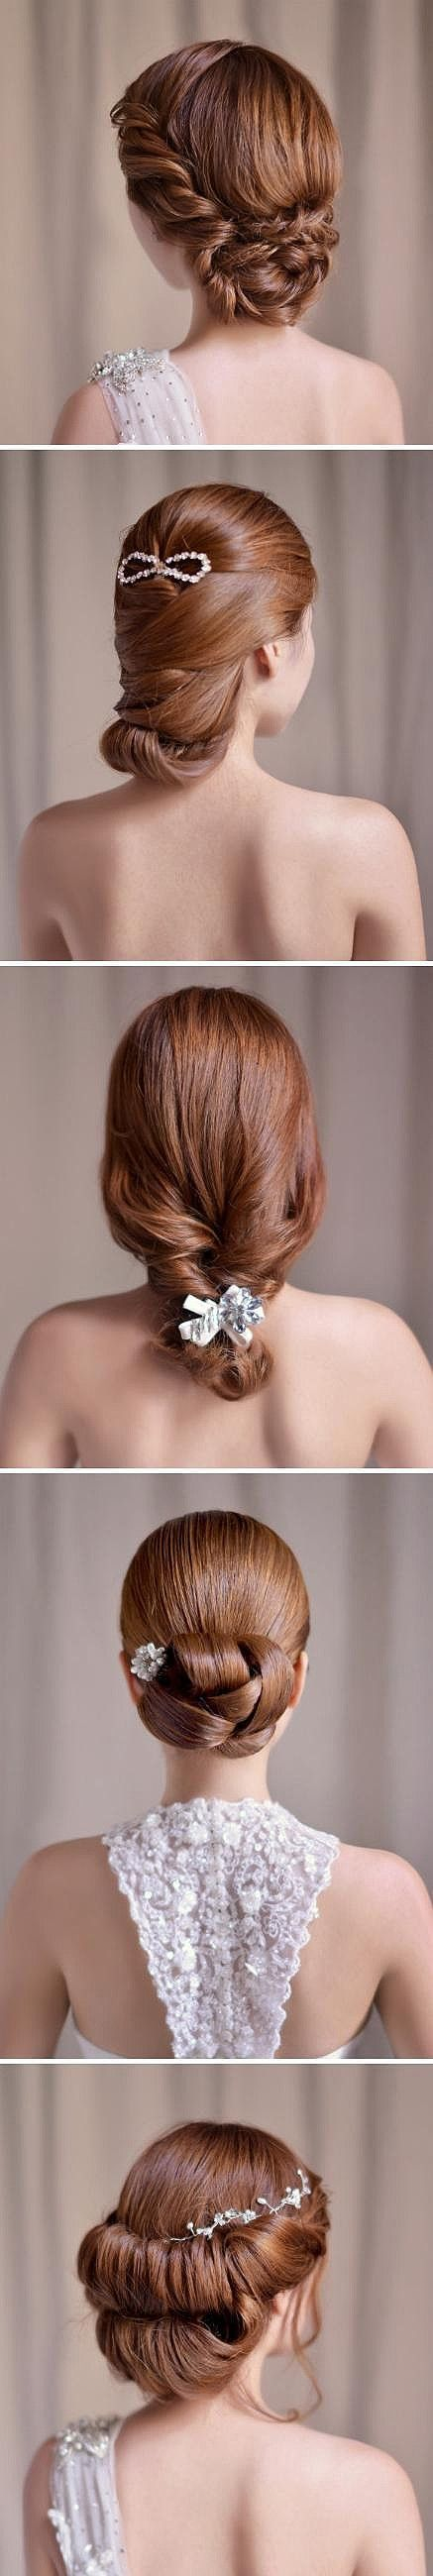 Hair for special elegant events hair pinterest wedding hair